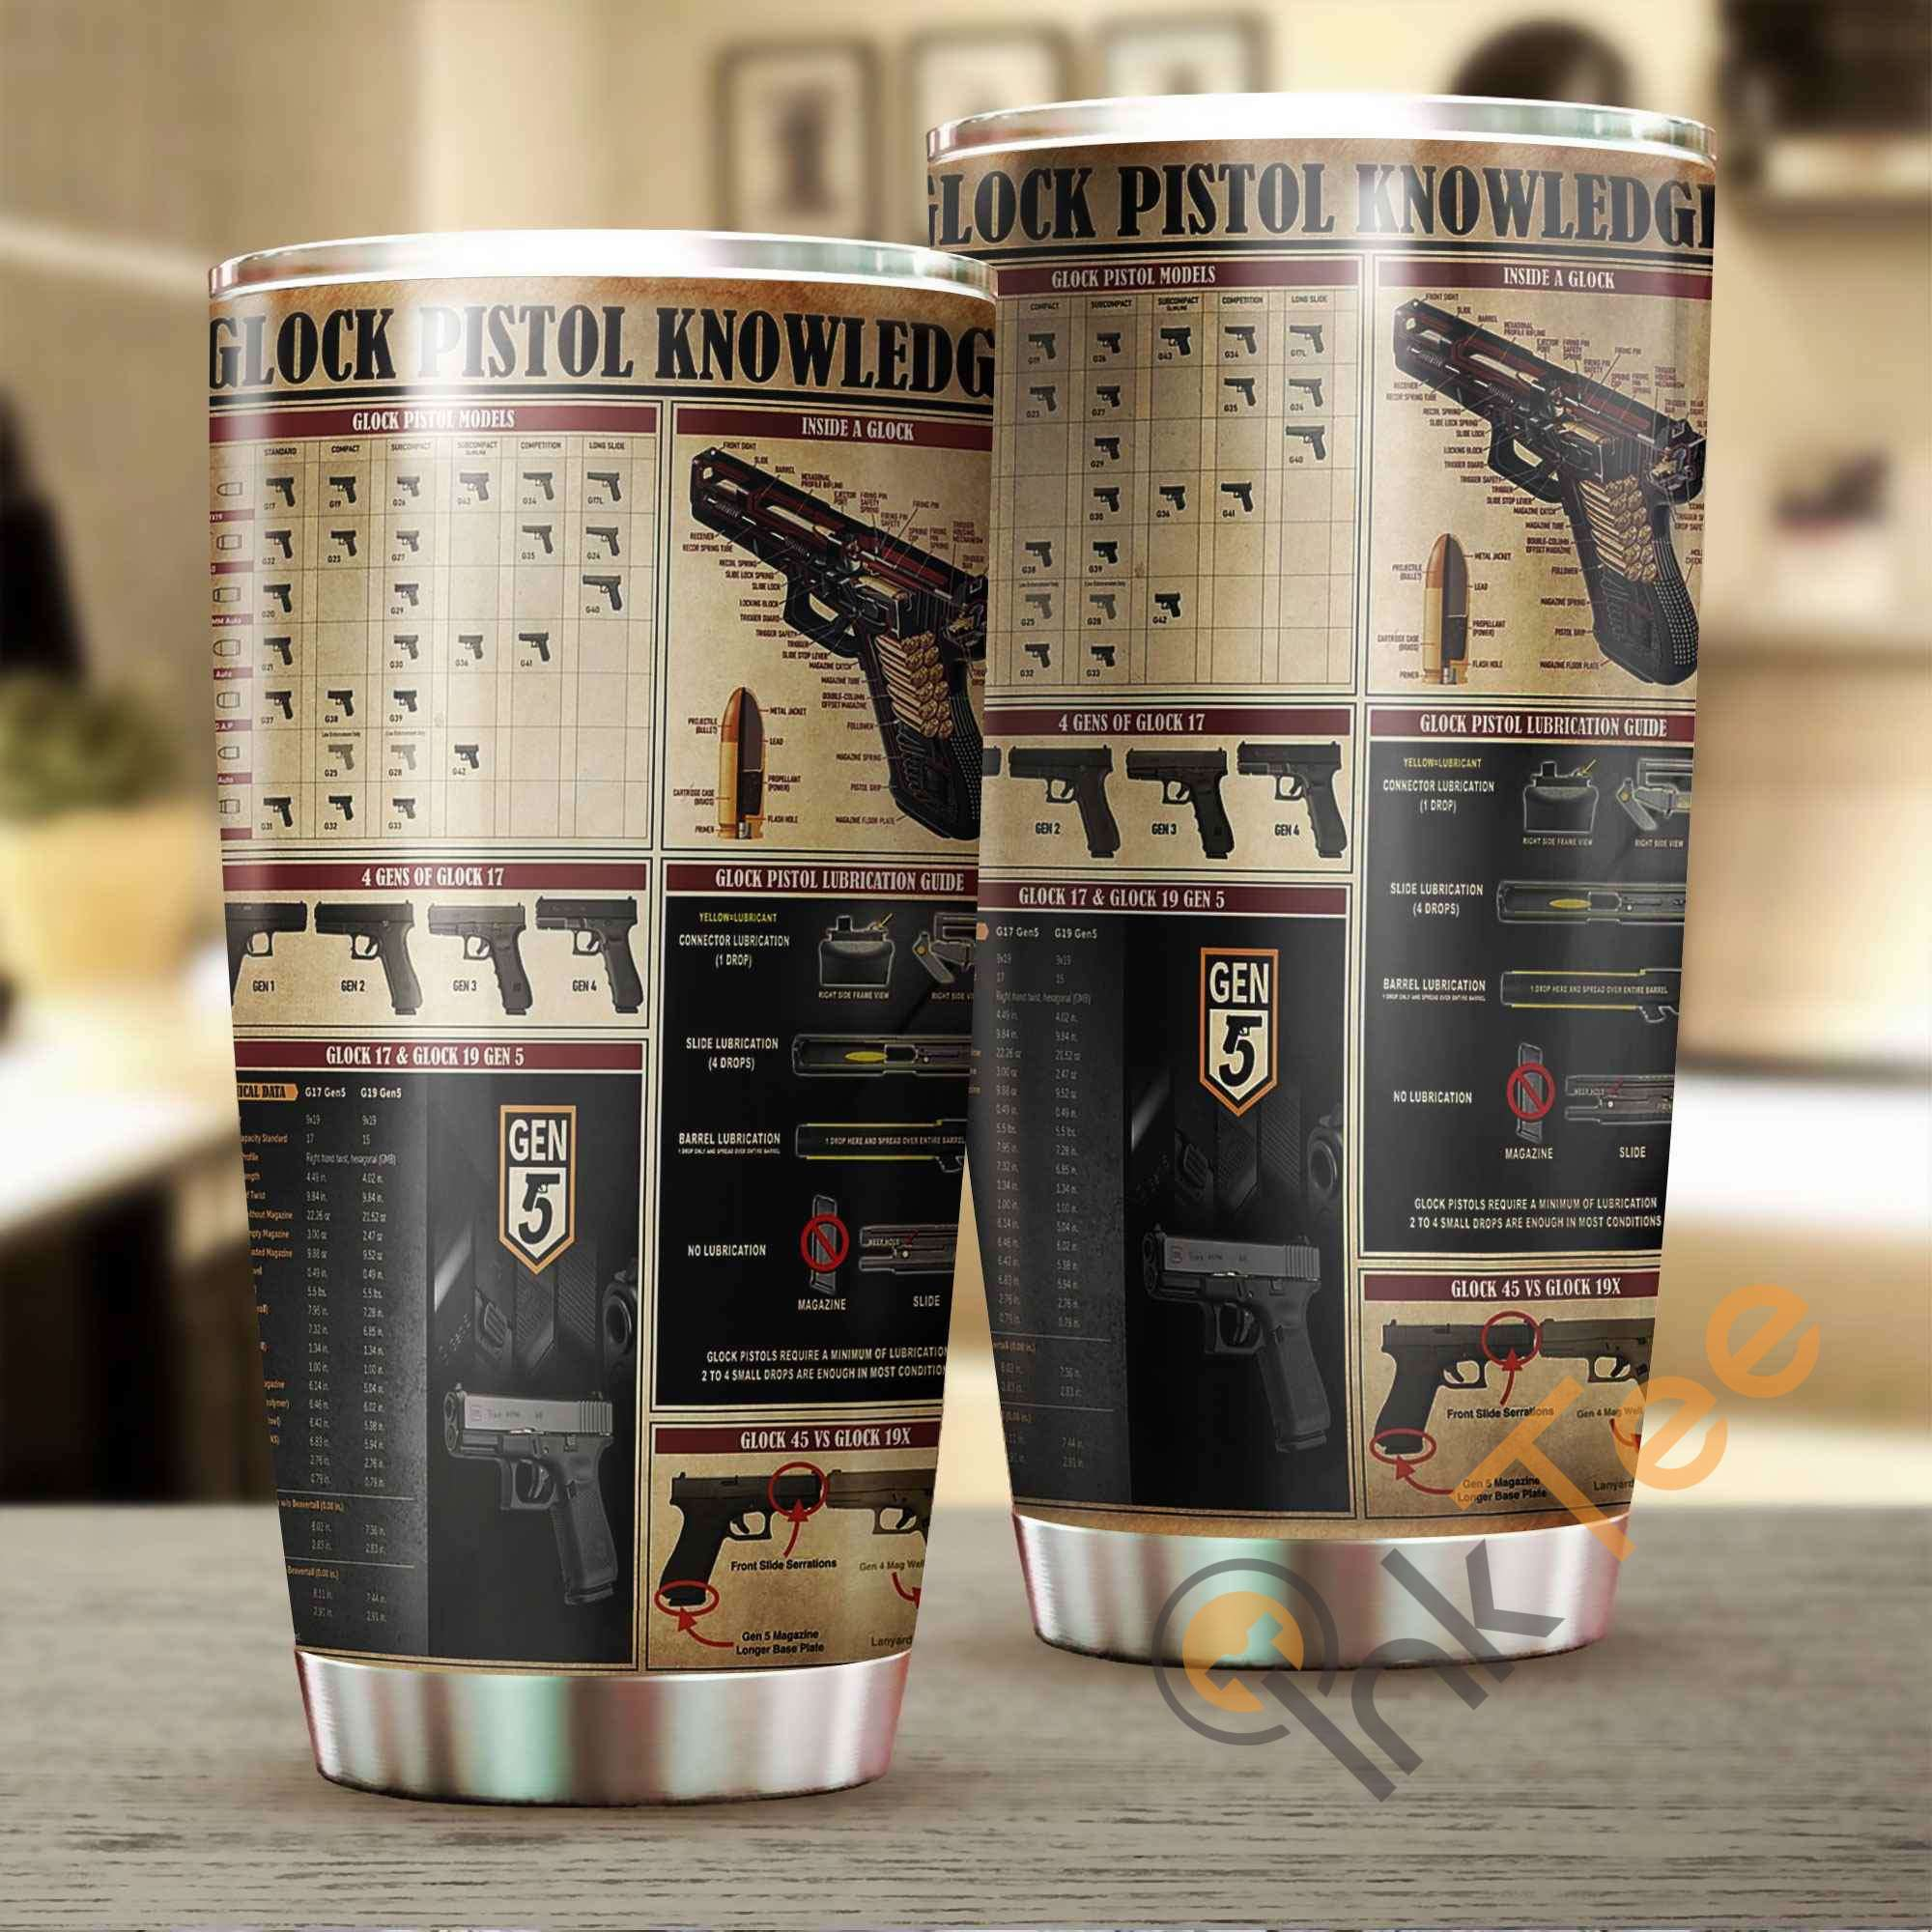 Glock Pistol Knowledge Amazon Best Seller Sku 2882 Stainless Steel Tumbler